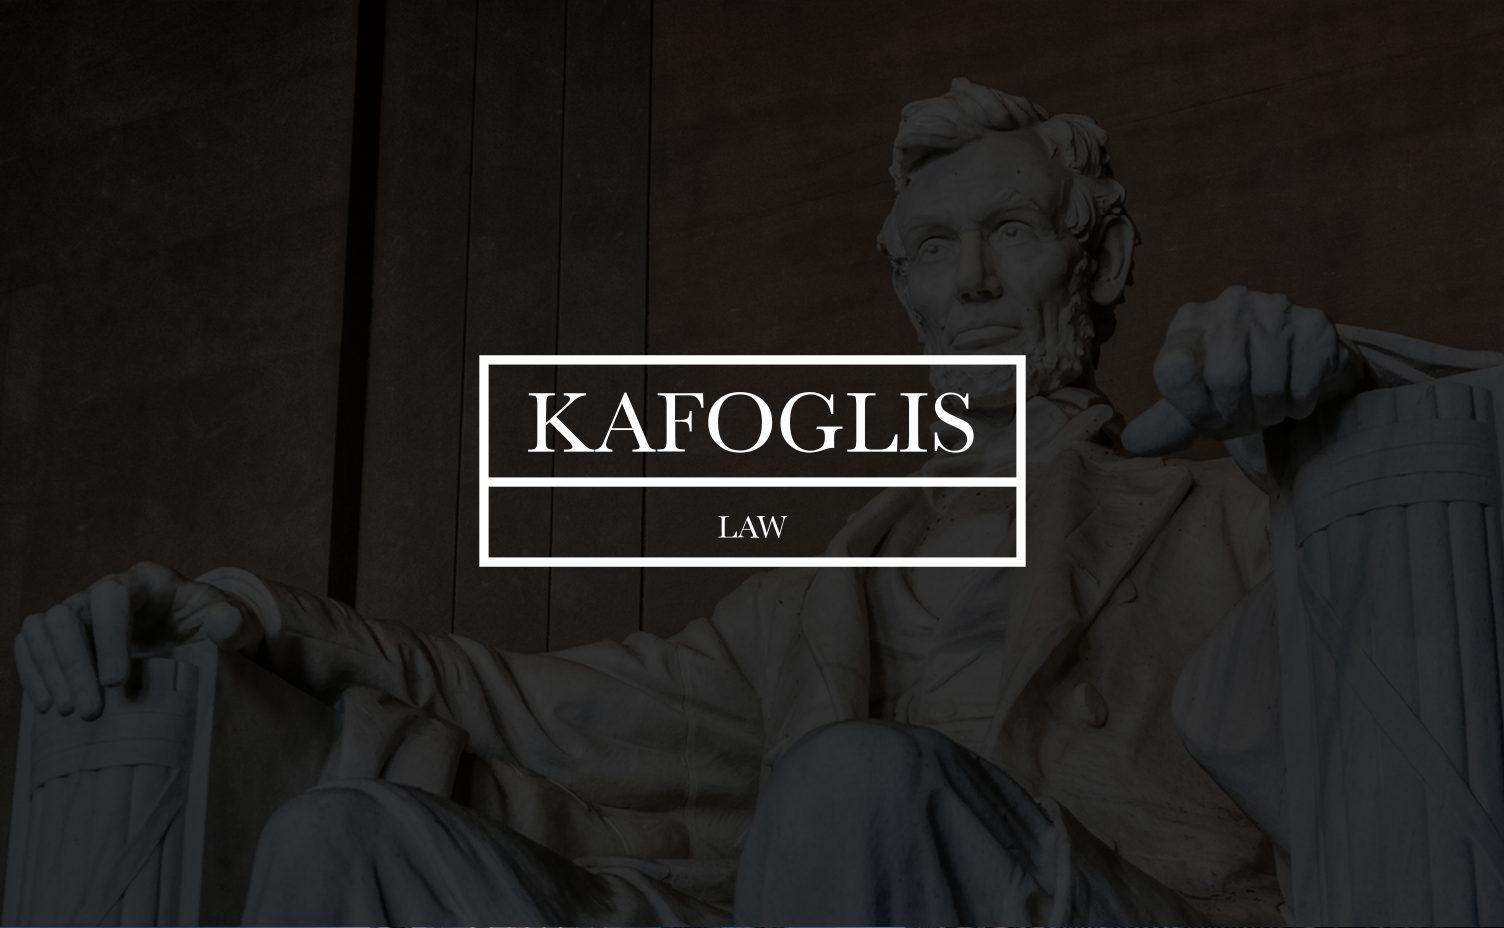 KAFOGLIS LAW